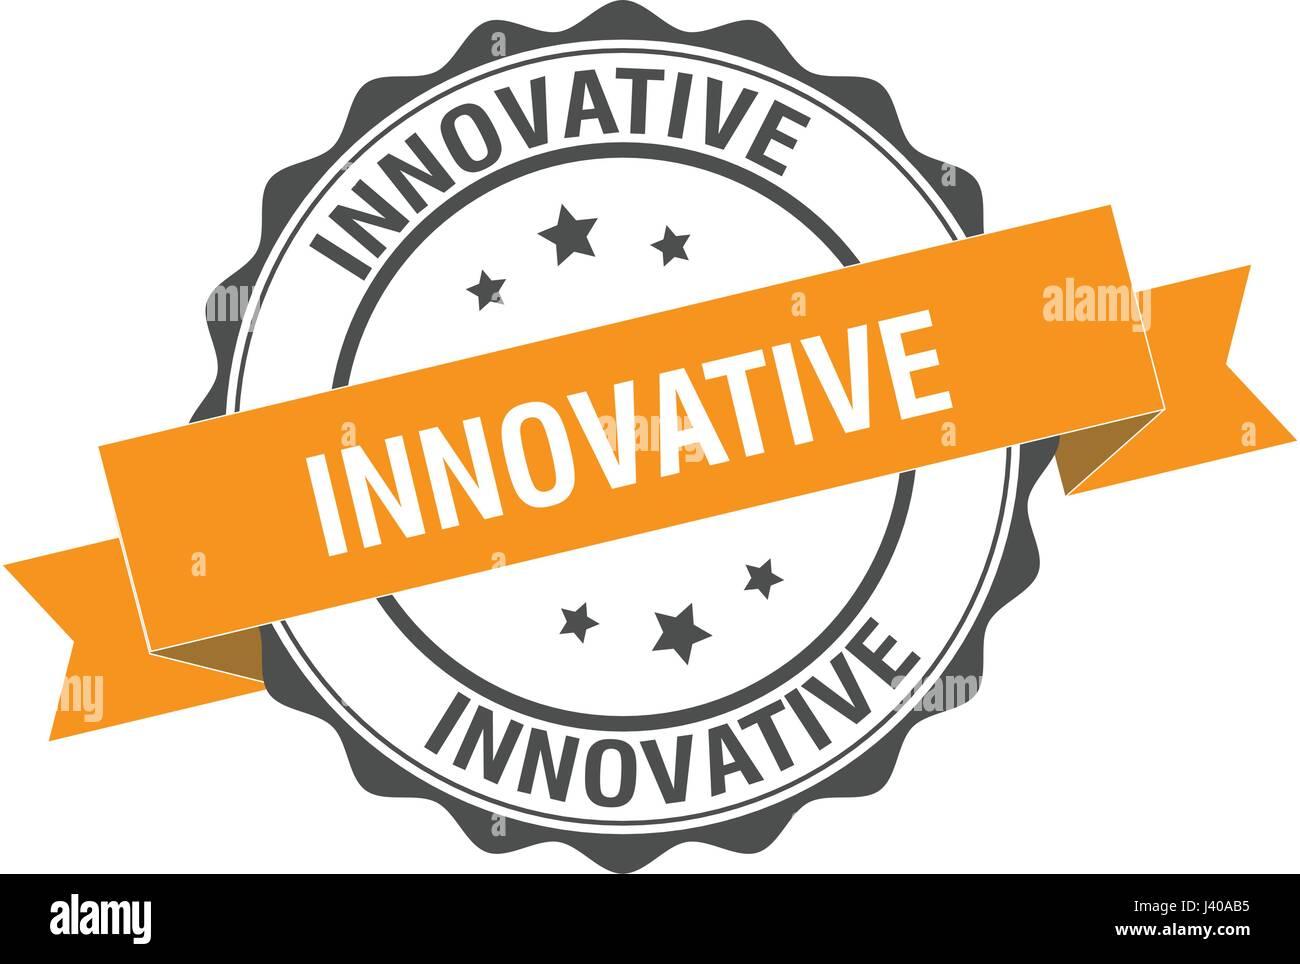 Ilustración de sello innovador Imagen De Stock